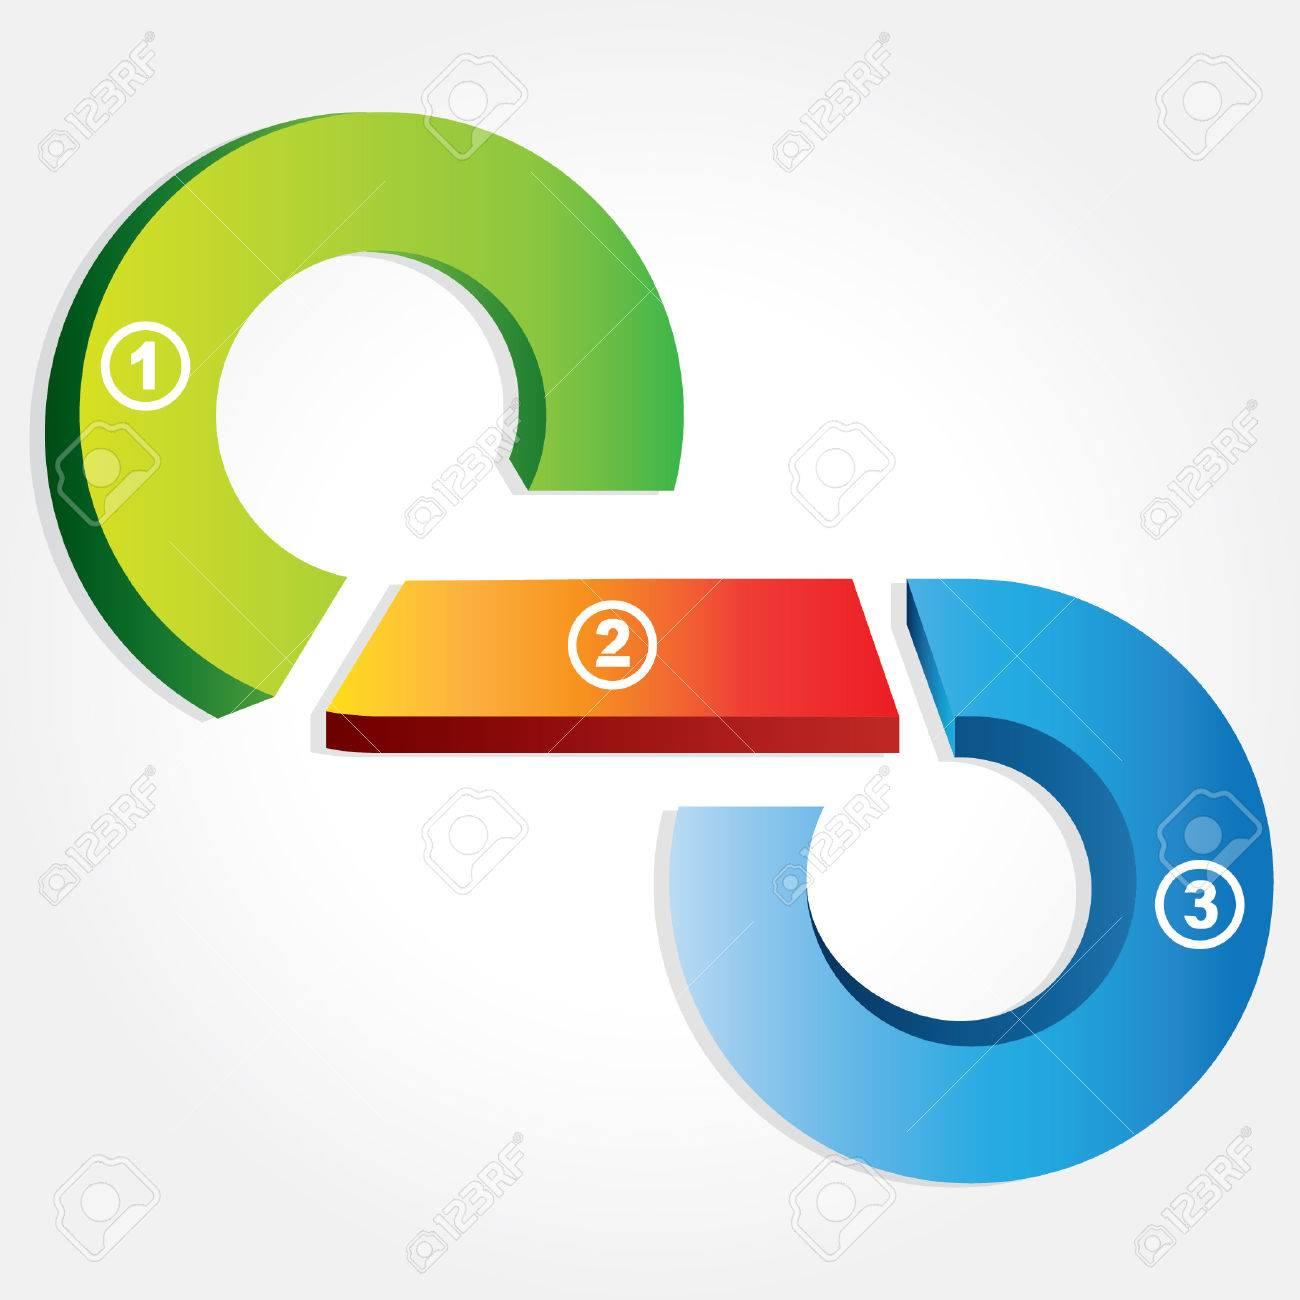 business process flow presentation, circular loop diagram Фото со стока -  24468315